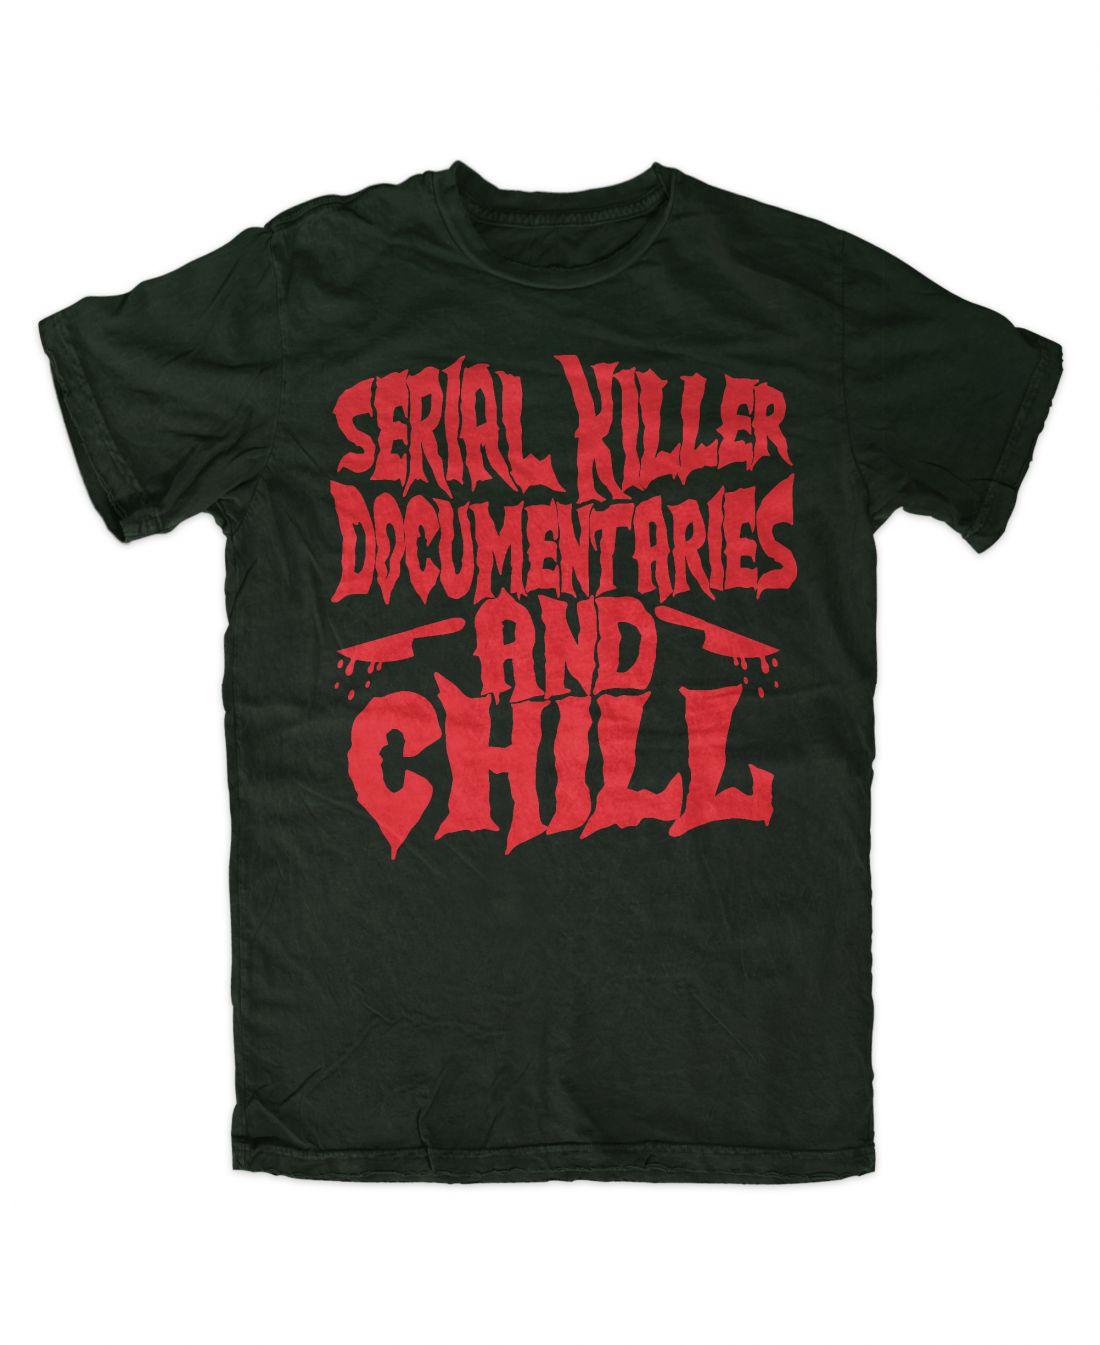 Serial Killer Documentaries (forest green póló)